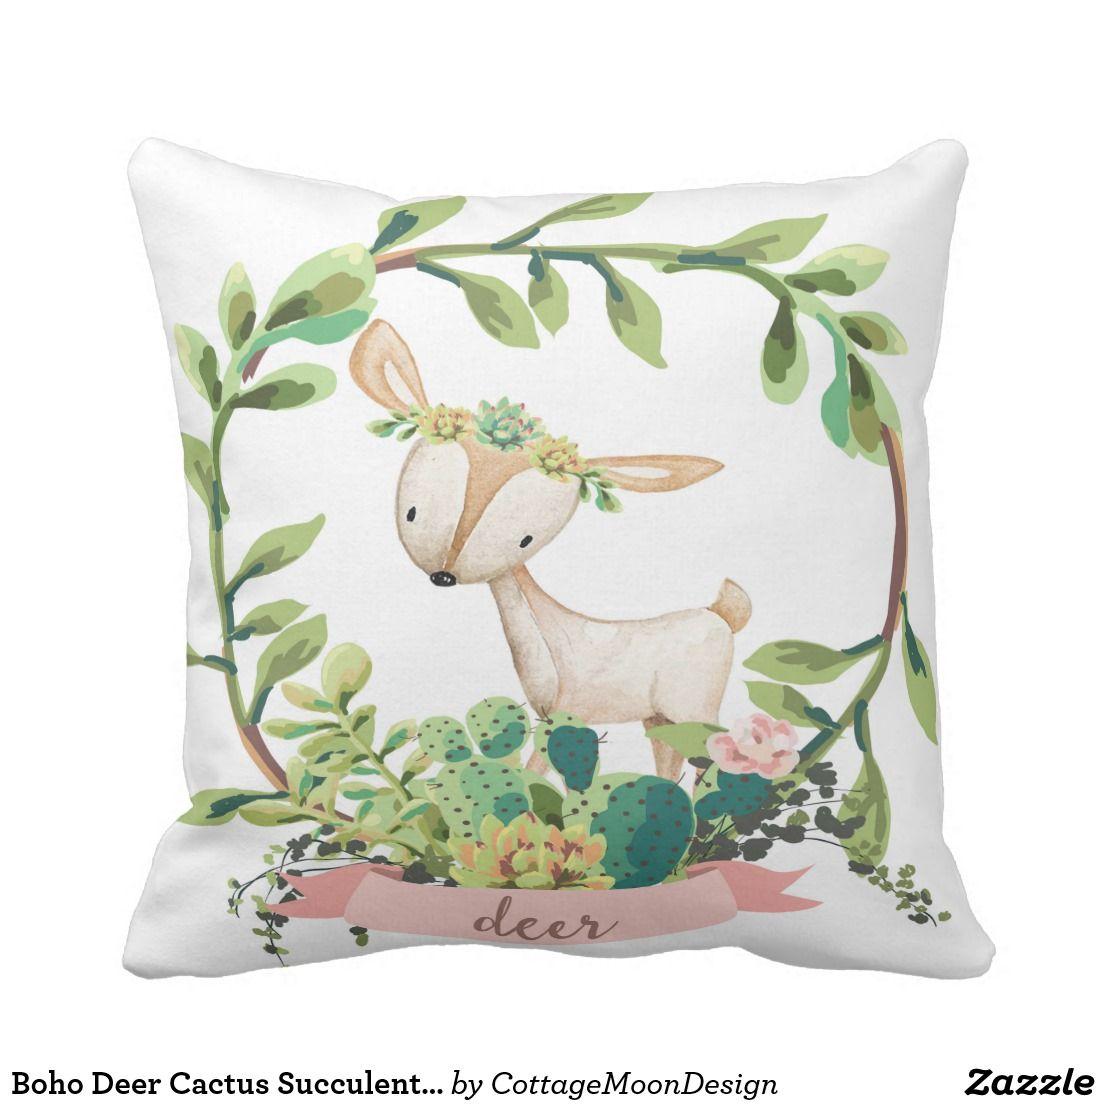 Boho deer cactus succulent baby nursery pillow future nursery